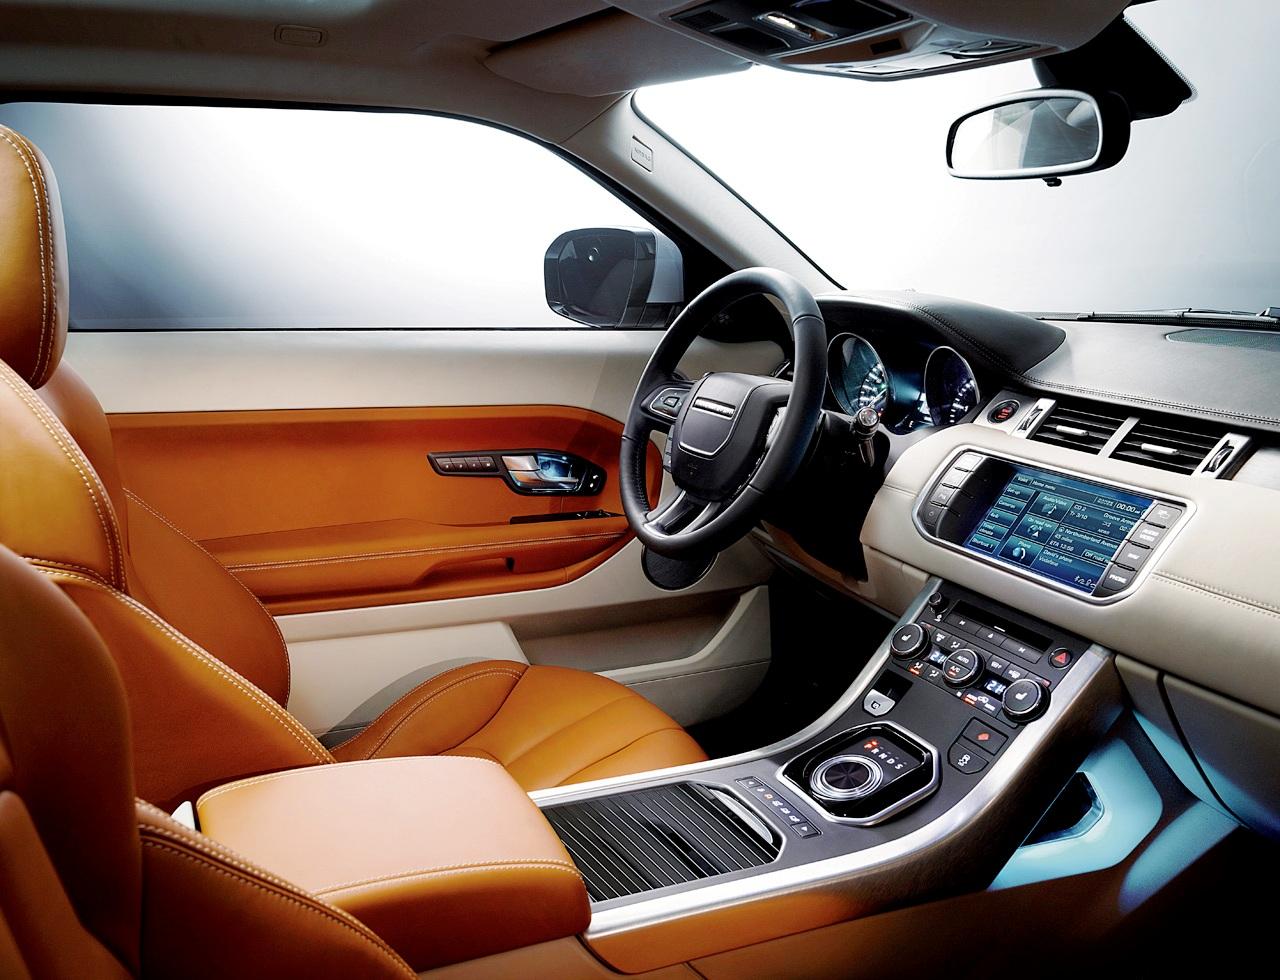 http://4.bp.blogspot.com/-ocyVh1AwFFg/TnNWPdGhOyI/AAAAAAAAEd4/B8io6gUFIag/s1600/2012-Range-Rover-Evoque-Victoria-Beckham-Edition+%252816%2529.jpg